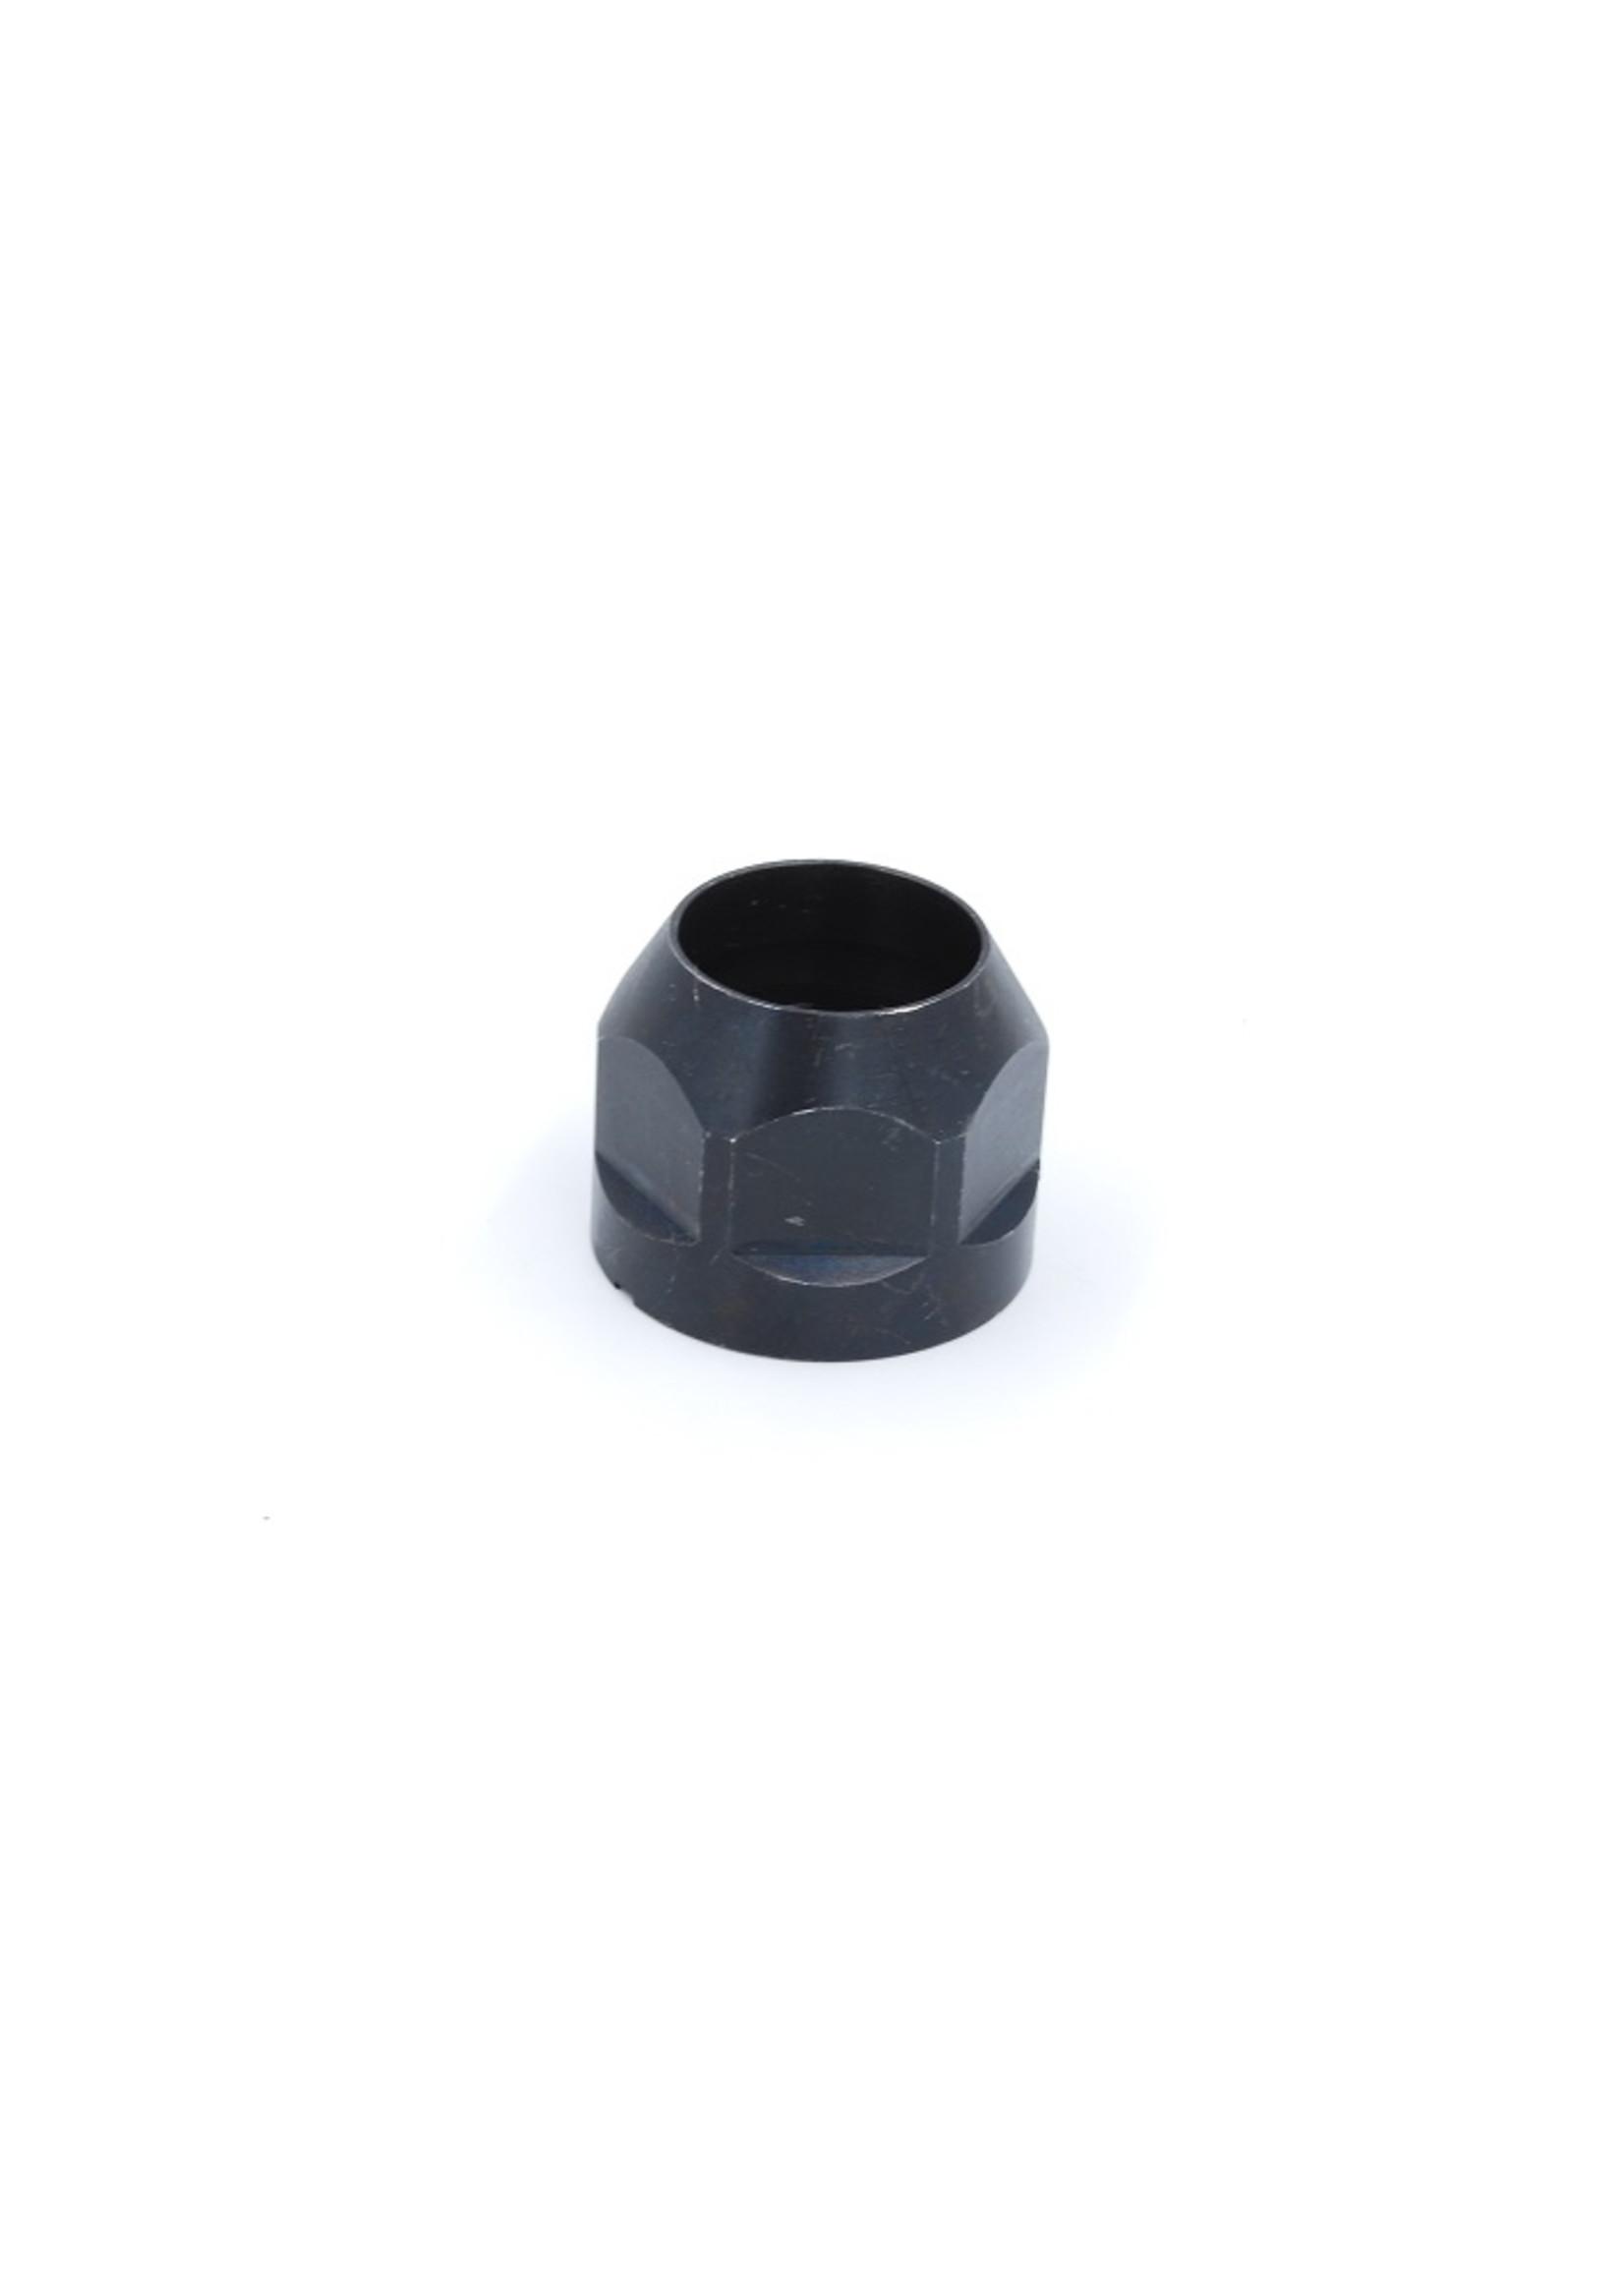 MP40 Collar Nut (Six Sided)